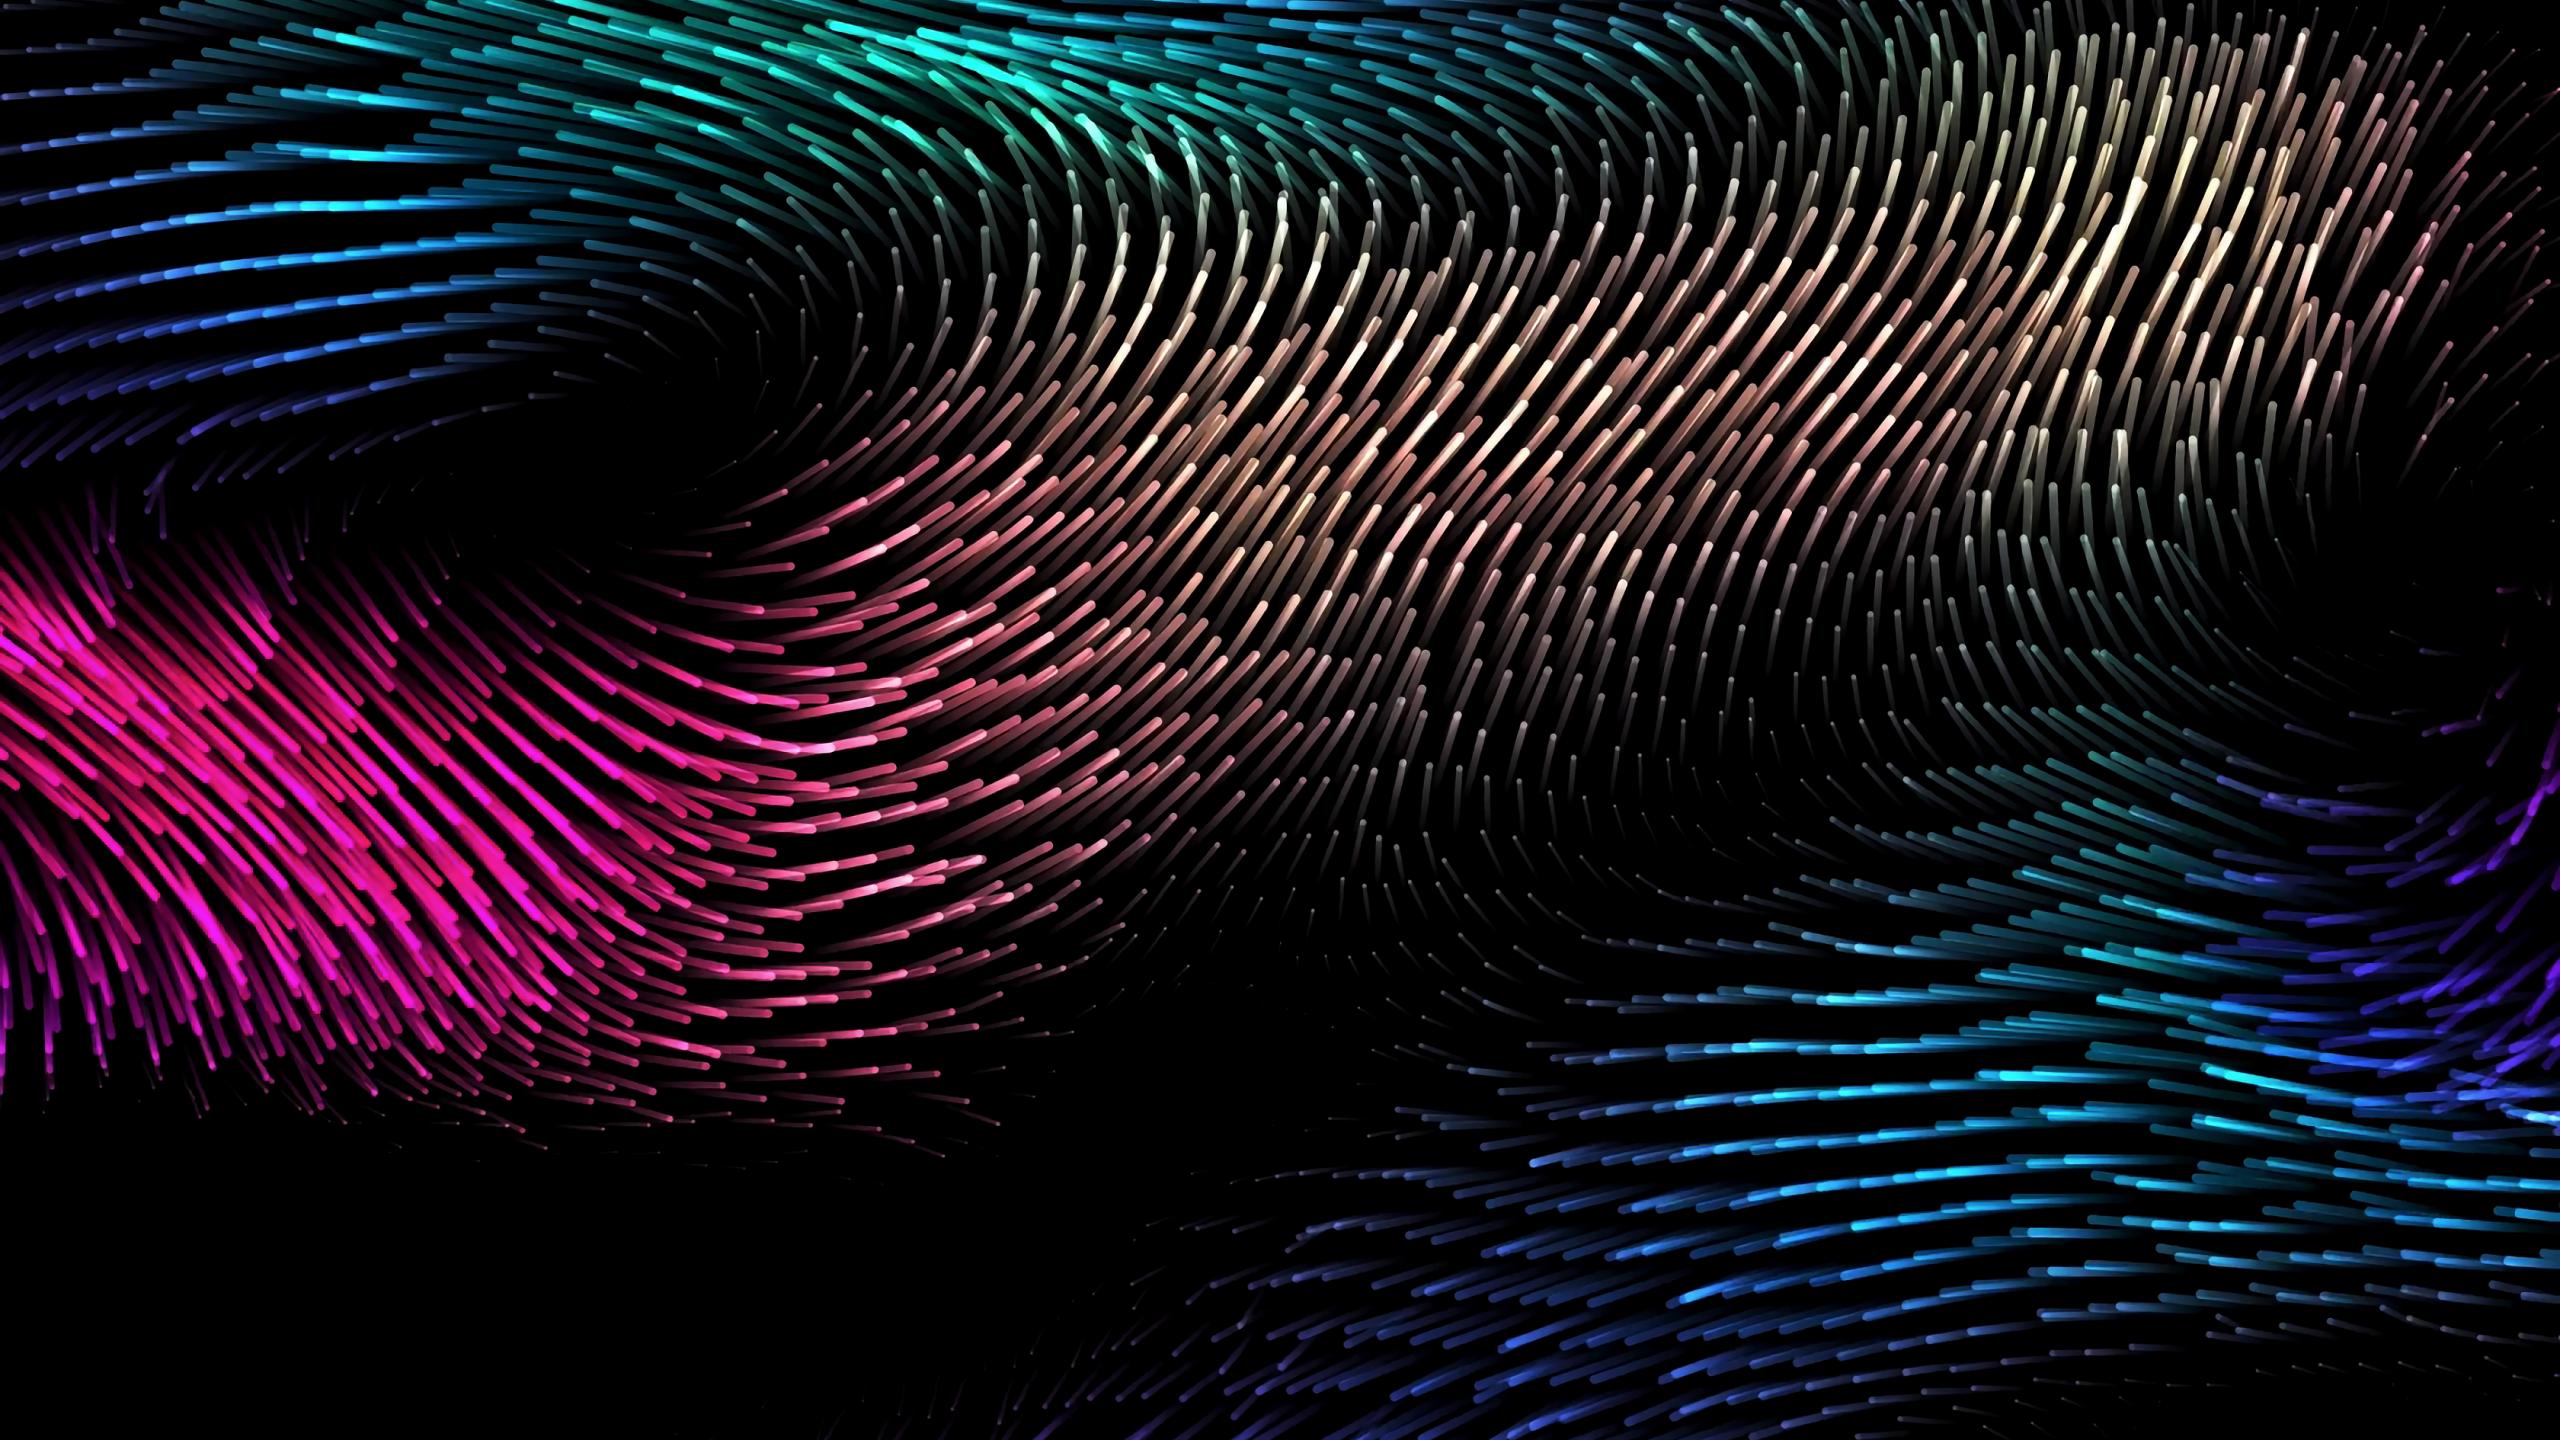 Drift 4k Wallpaper Macos Catalina Colorful Waves Black Background Amoled Abstract 2255